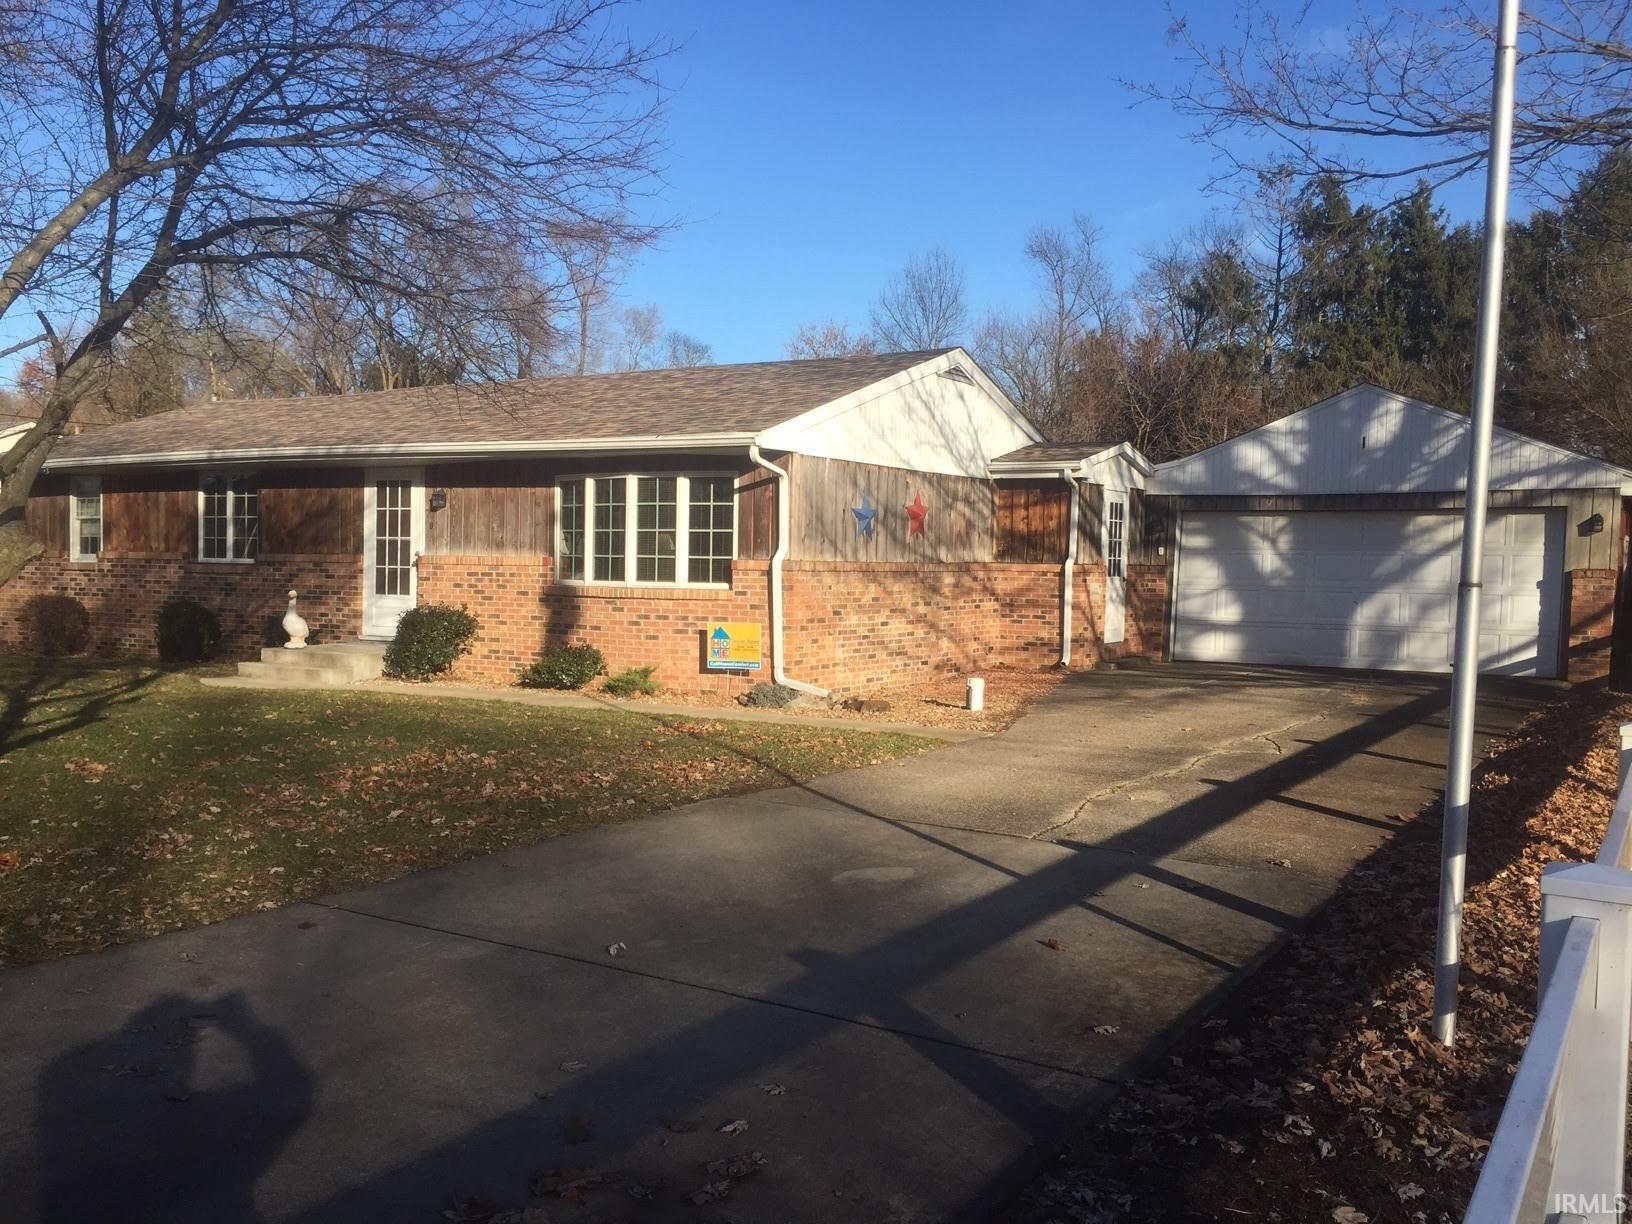 54610 County Road 1 Elkhart, IN 46514